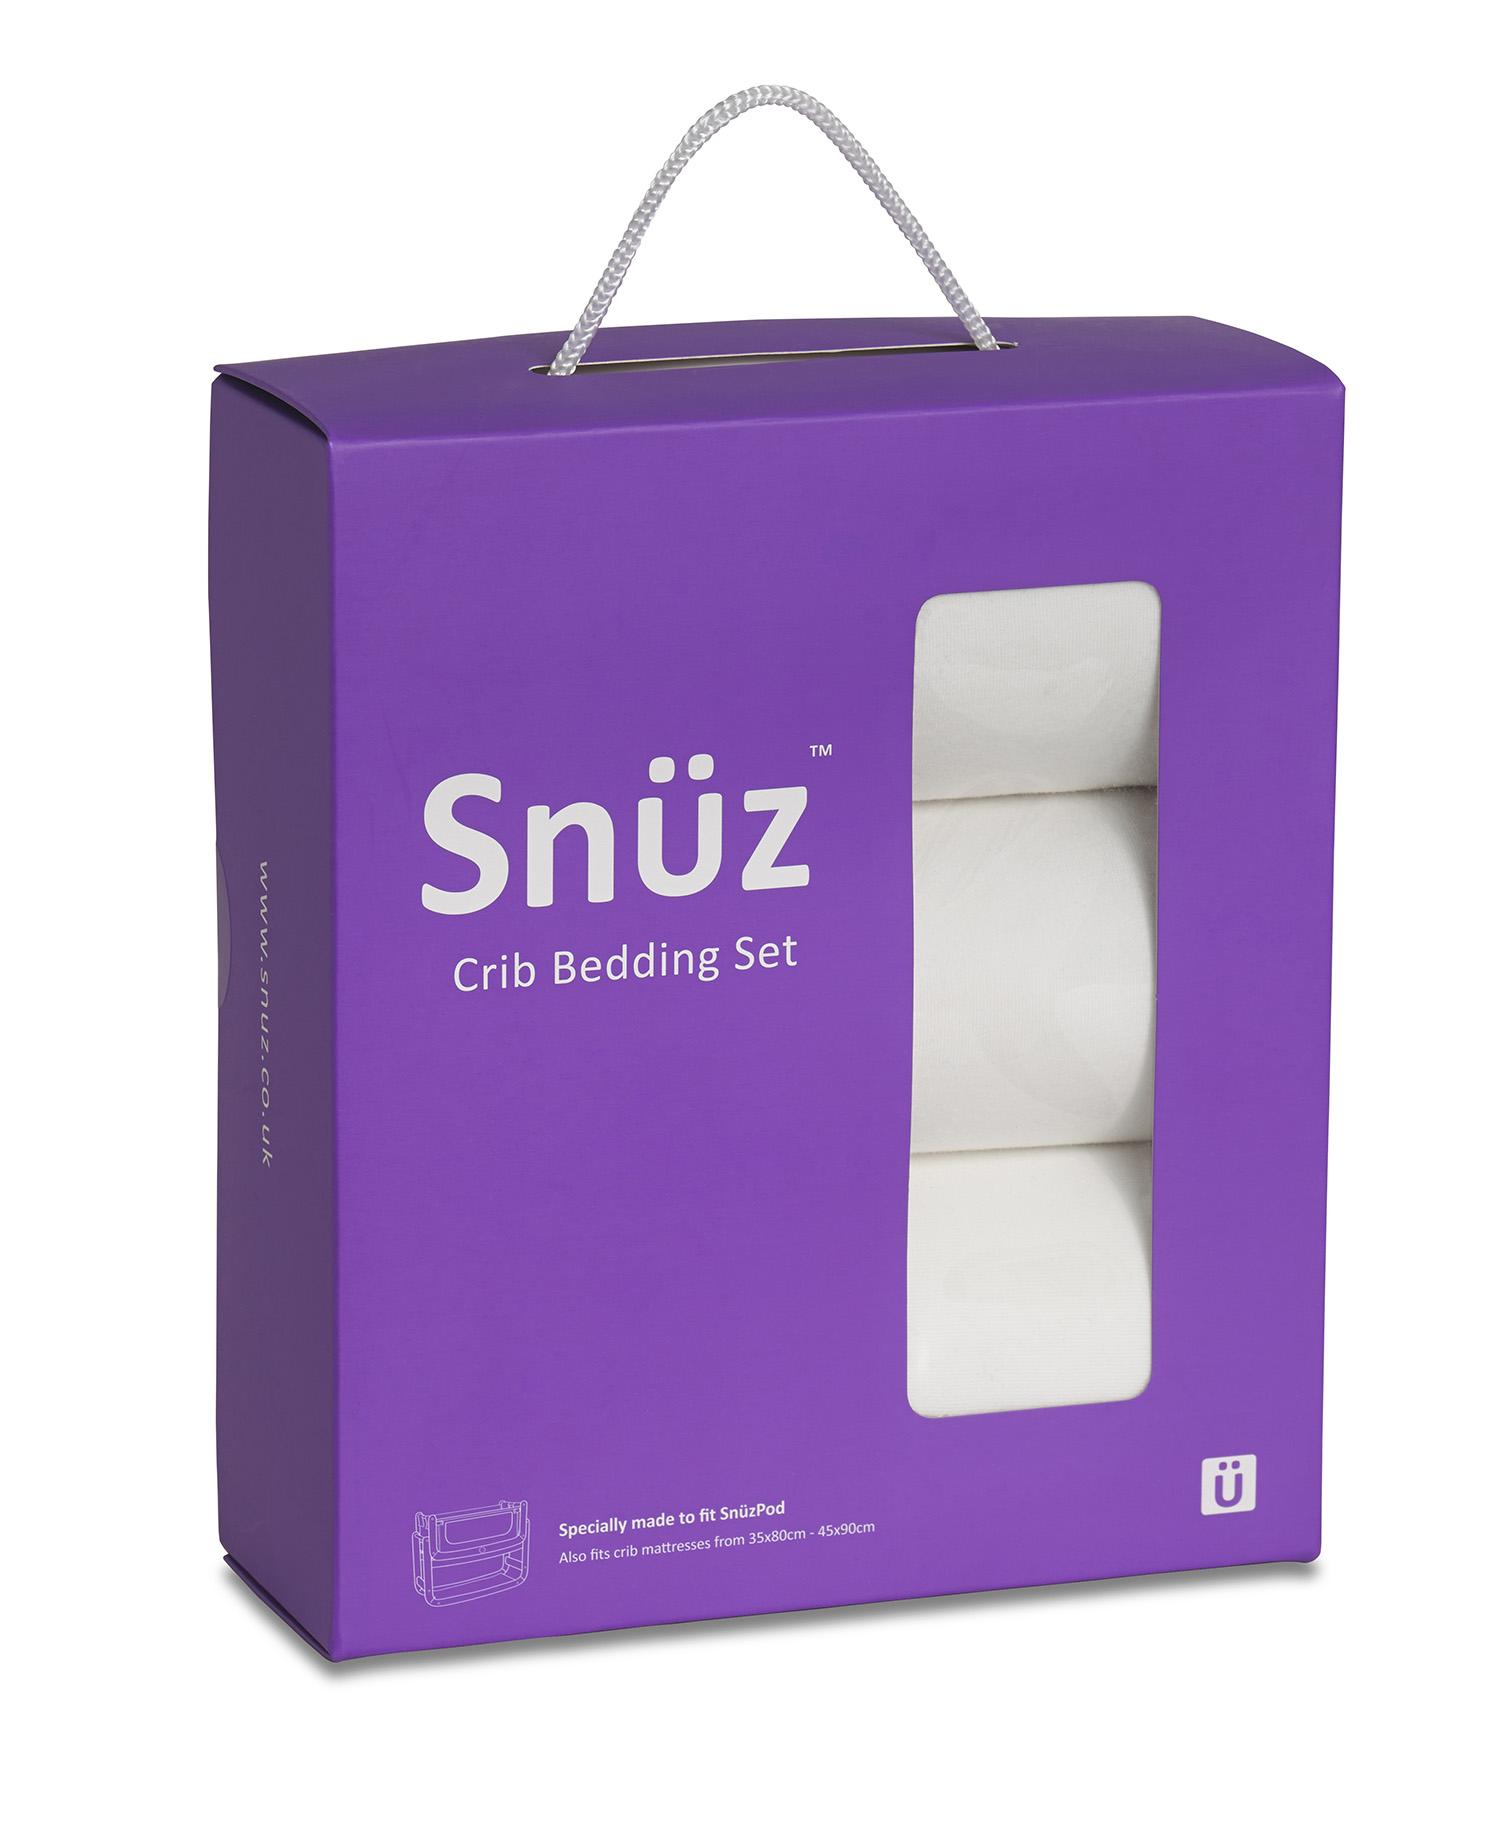 Snuz 3pc. Bedside Crib Bedding Set - White